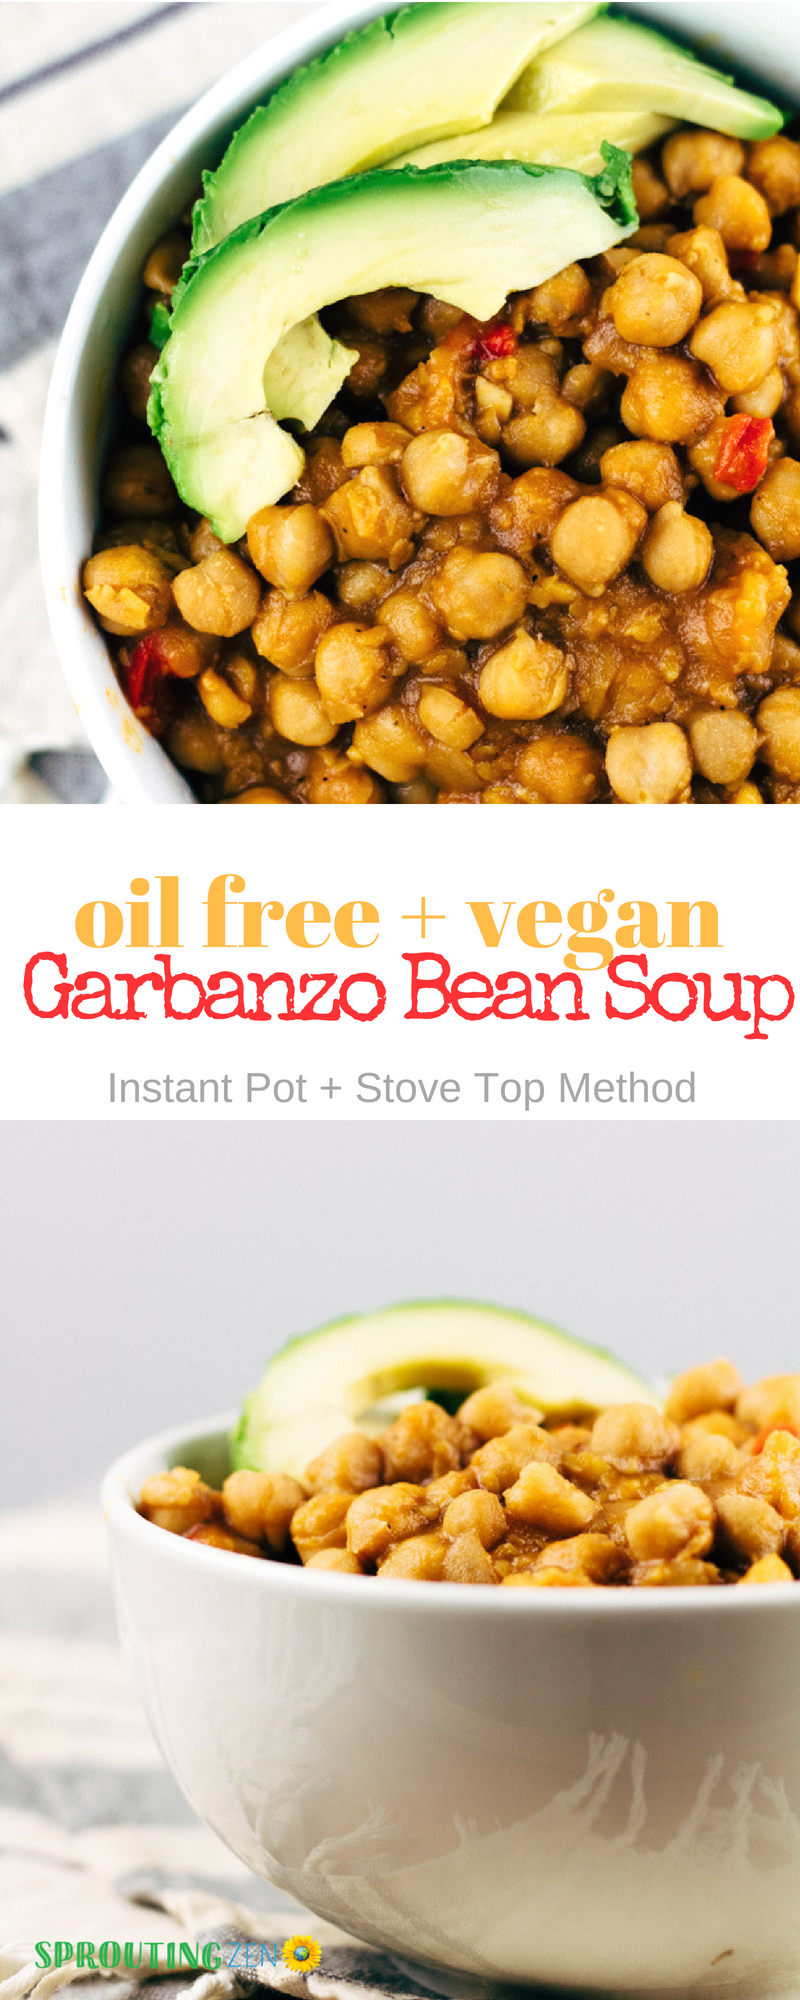 Easy Cuban-Inspired Oil free Garbanzo Bean Soup Recipe #vegan #plantbased #gluten free